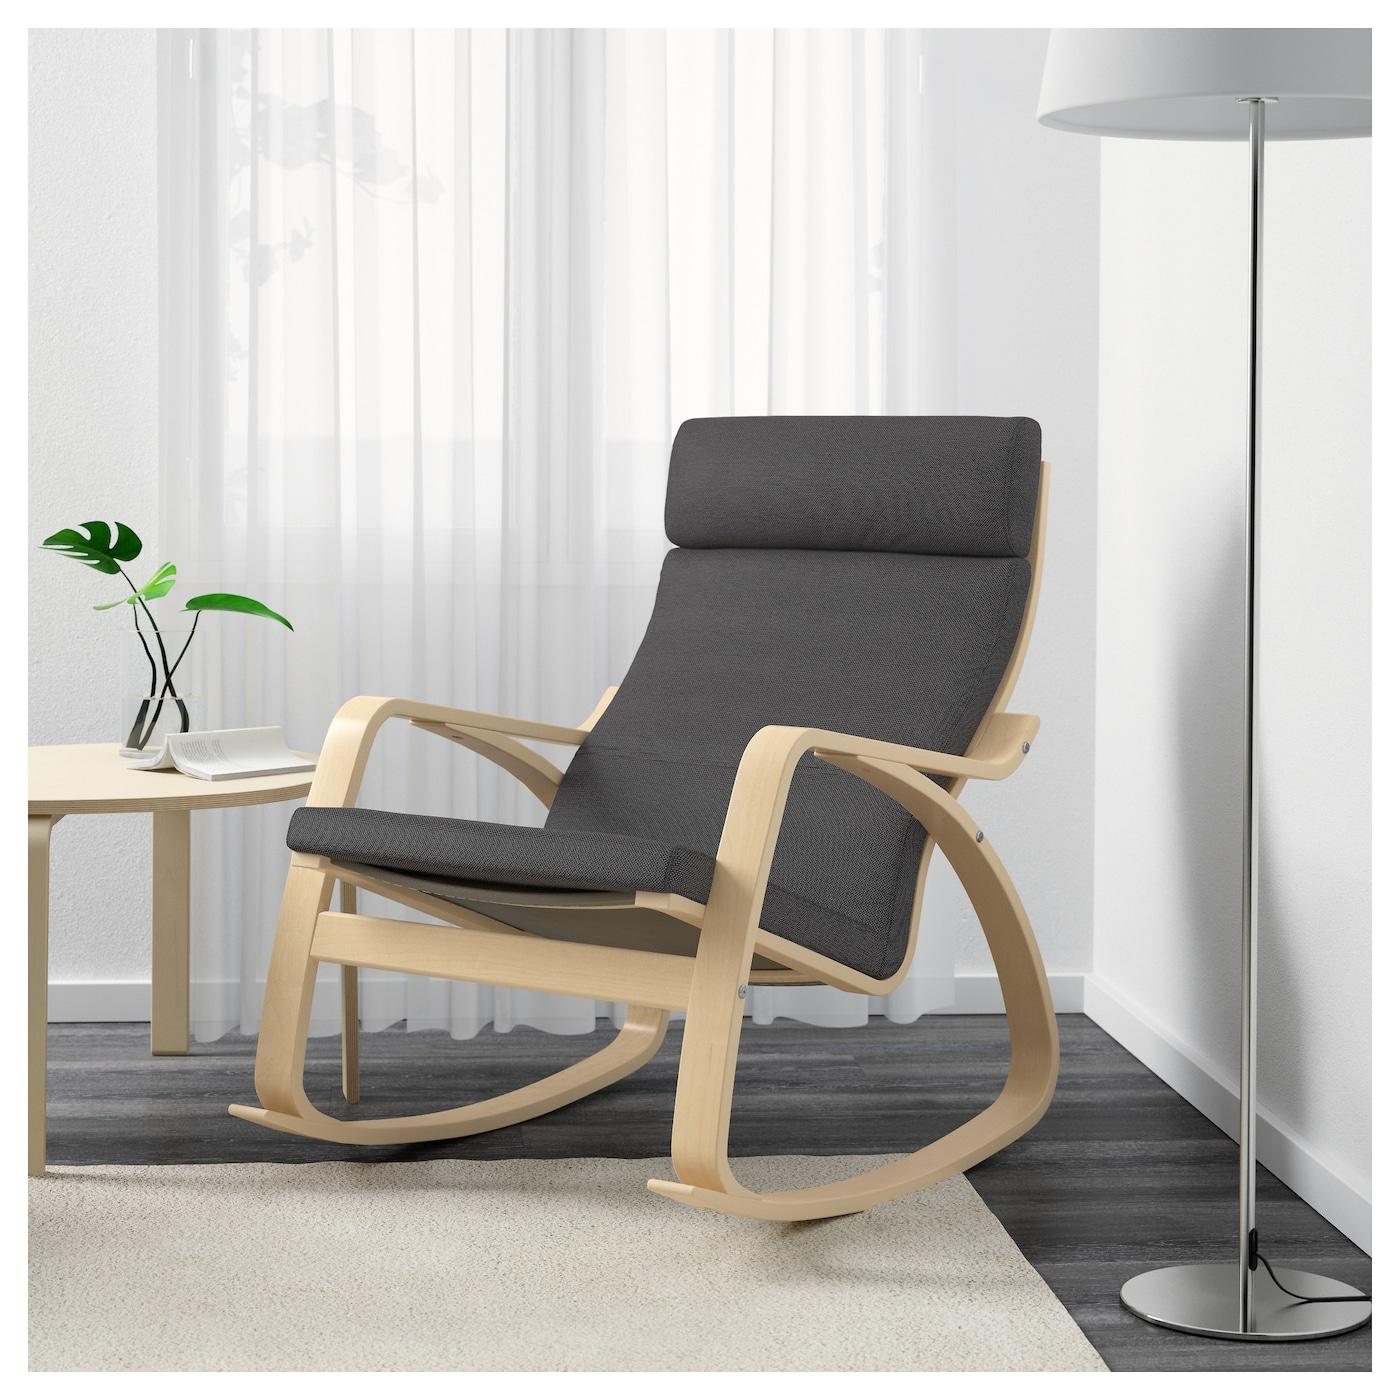 po ng fauteuil bascule plaqu bouleau finnsta gris ikea. Black Bedroom Furniture Sets. Home Design Ideas